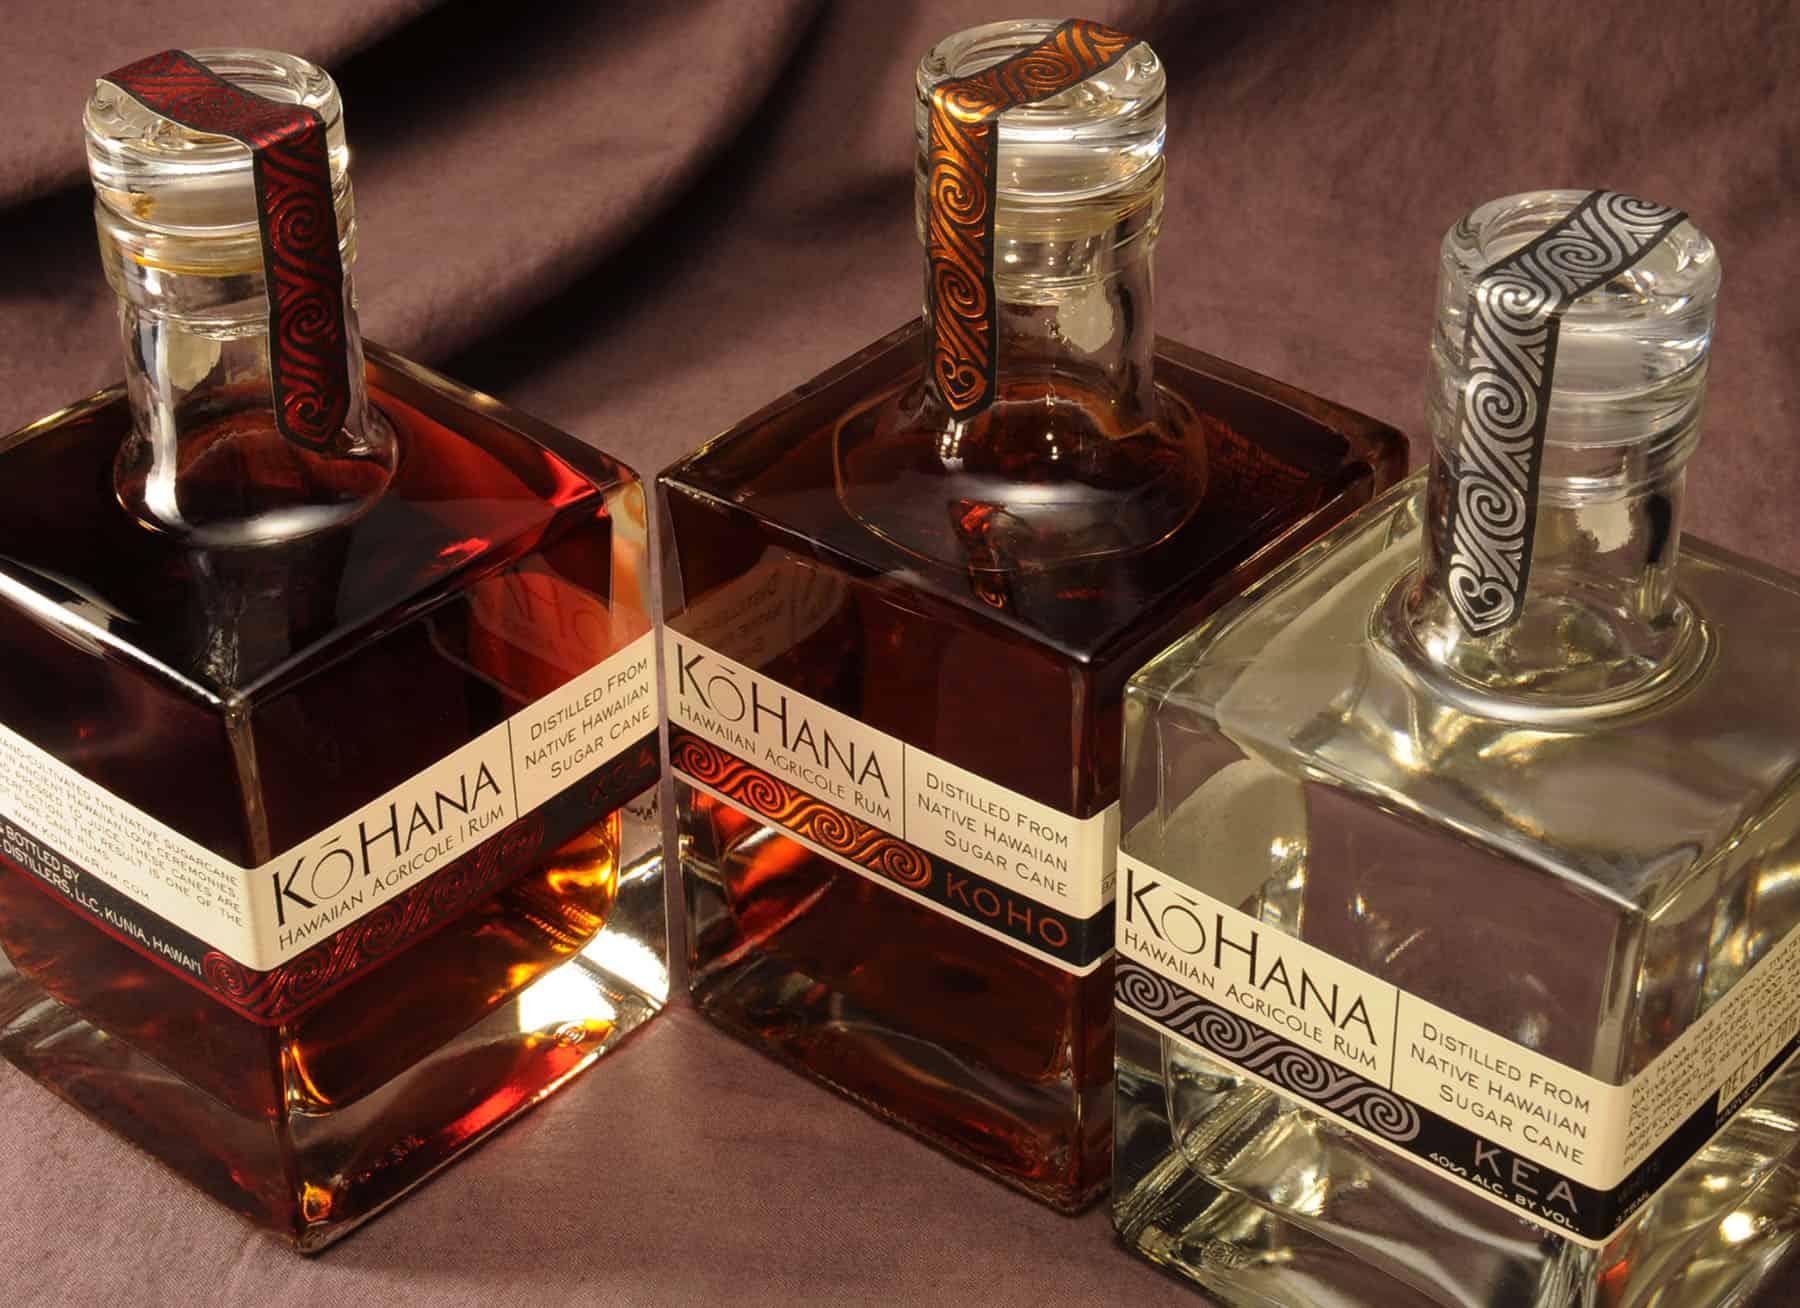 Kō Hana Hawaiian Agricole Rum group of three bottles